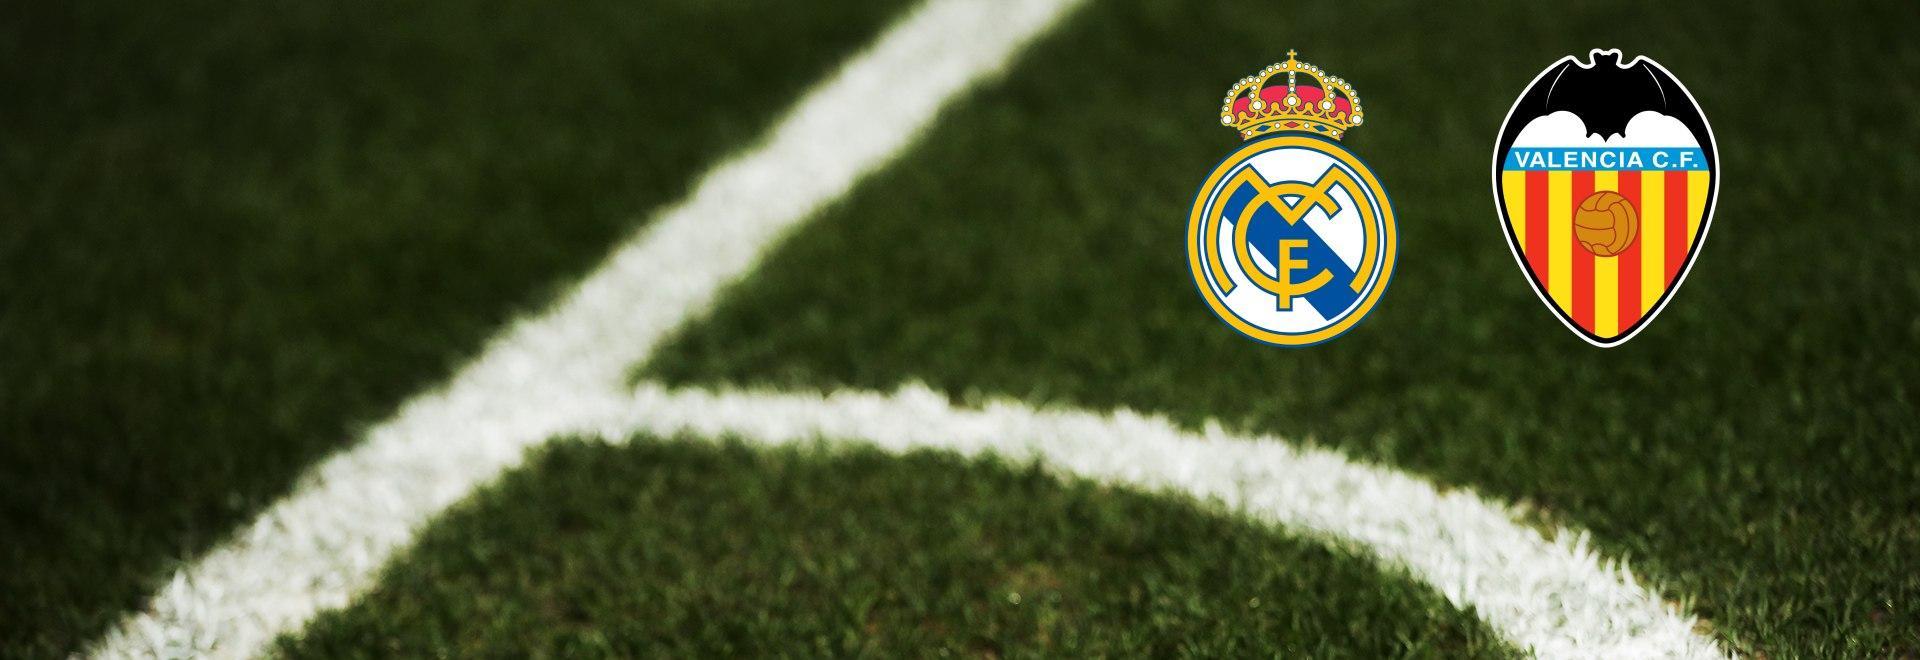 Real Madrid - Valencia. 29a g.